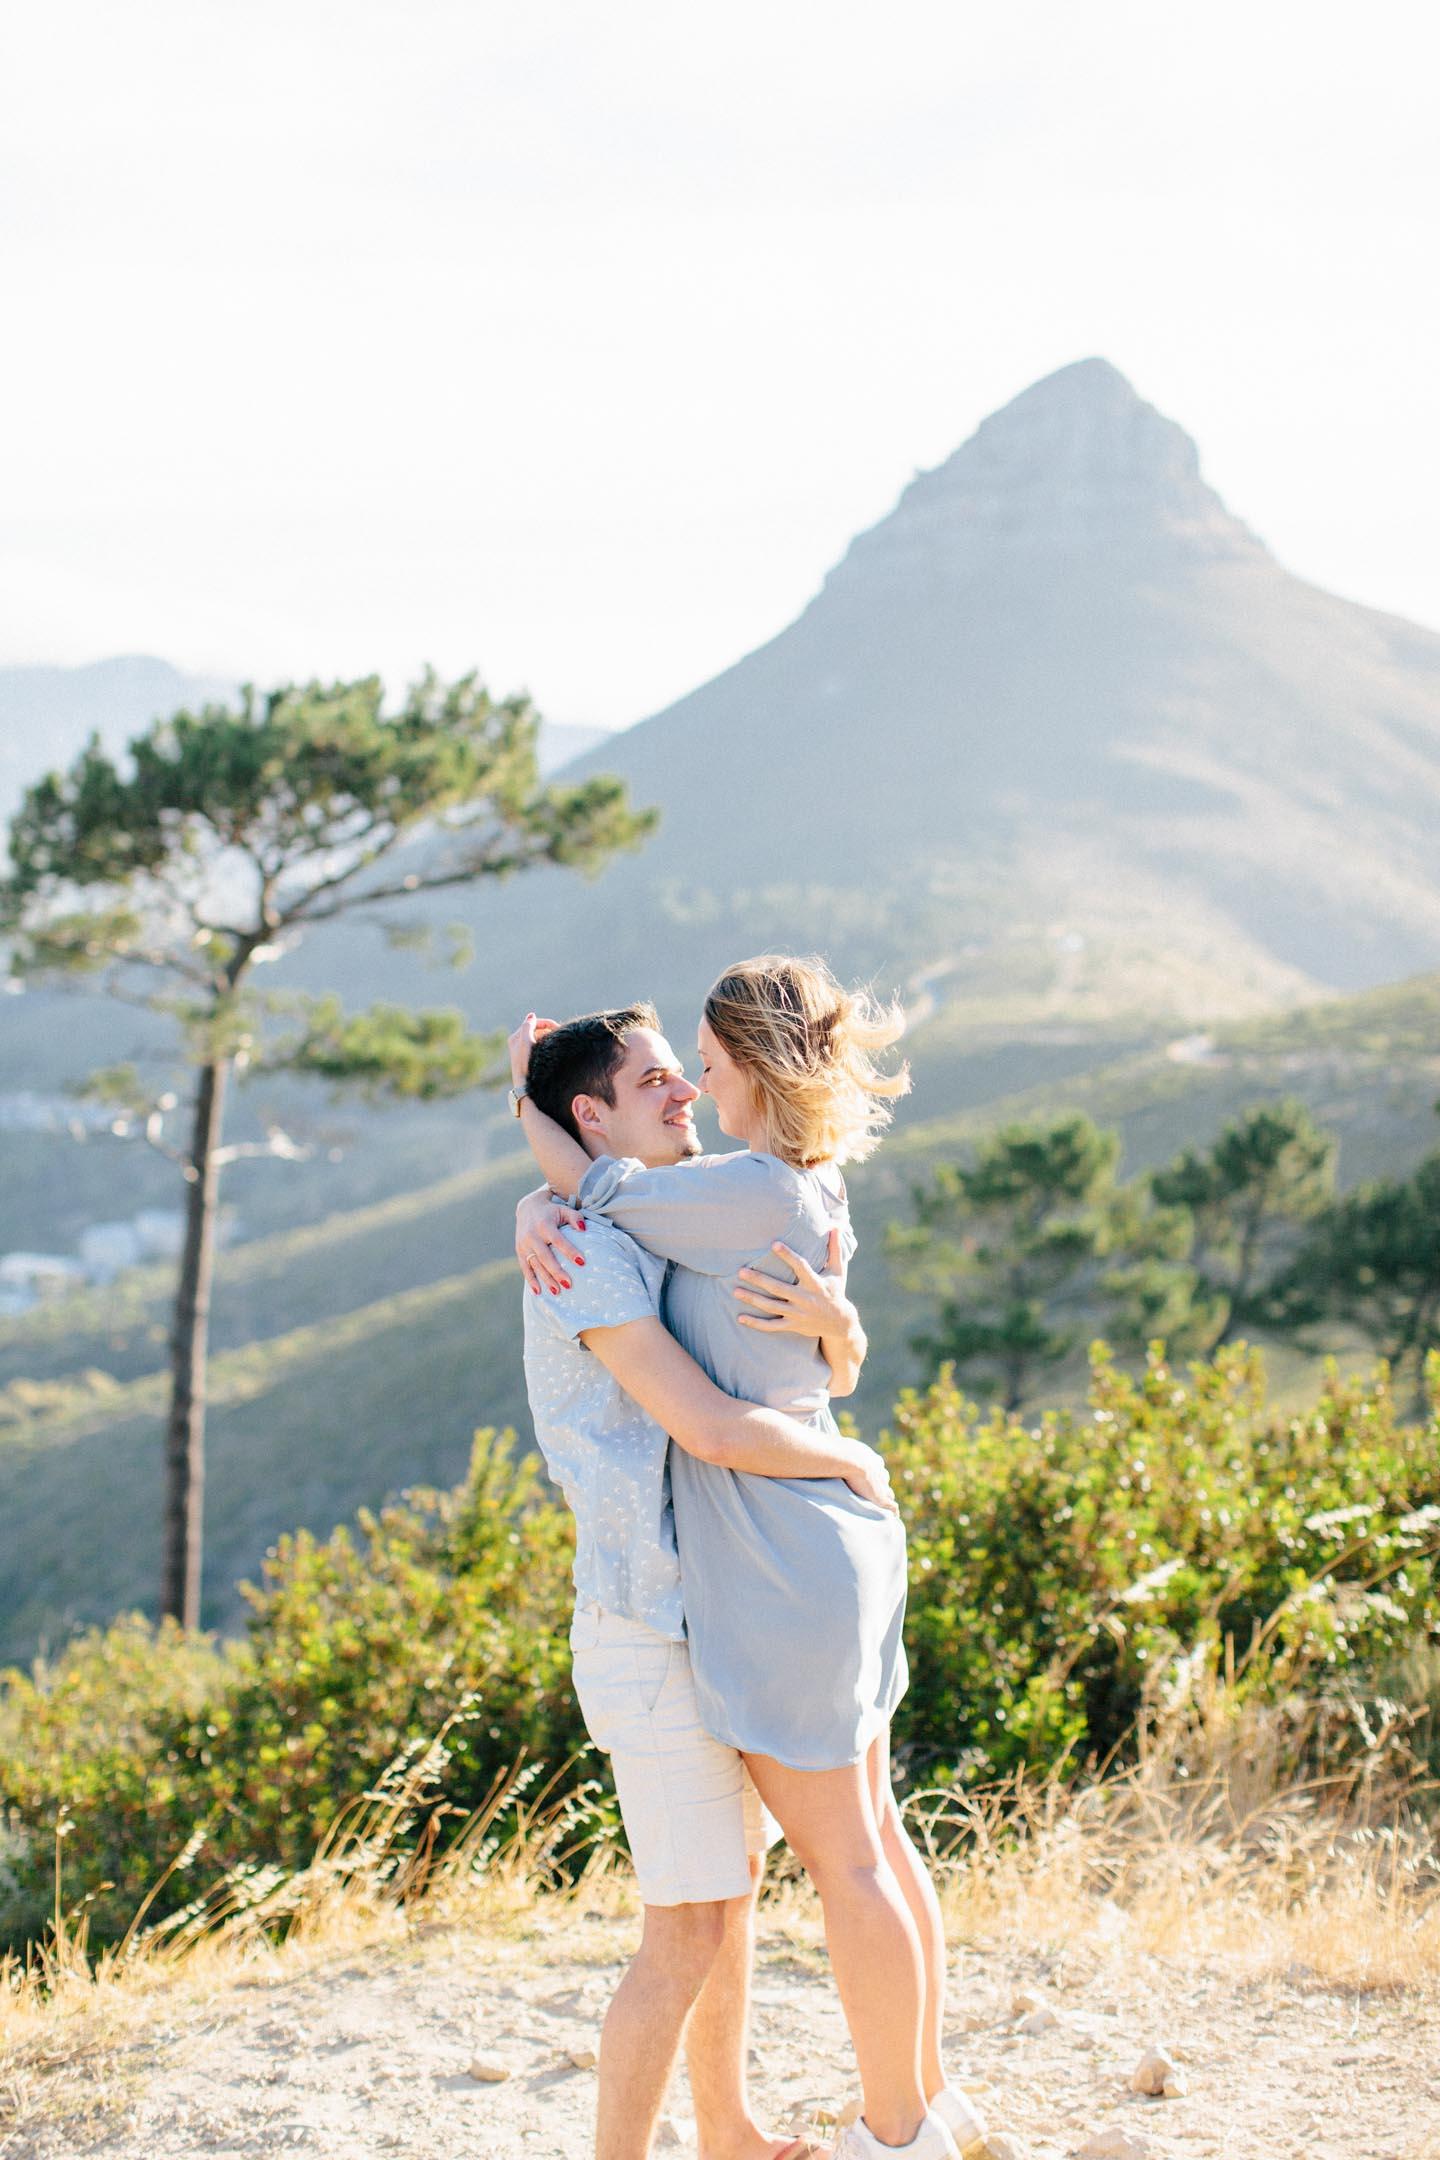 Vanessa_Esau_SouthAfrica_Capetown_Kapstadt_Travel (88)